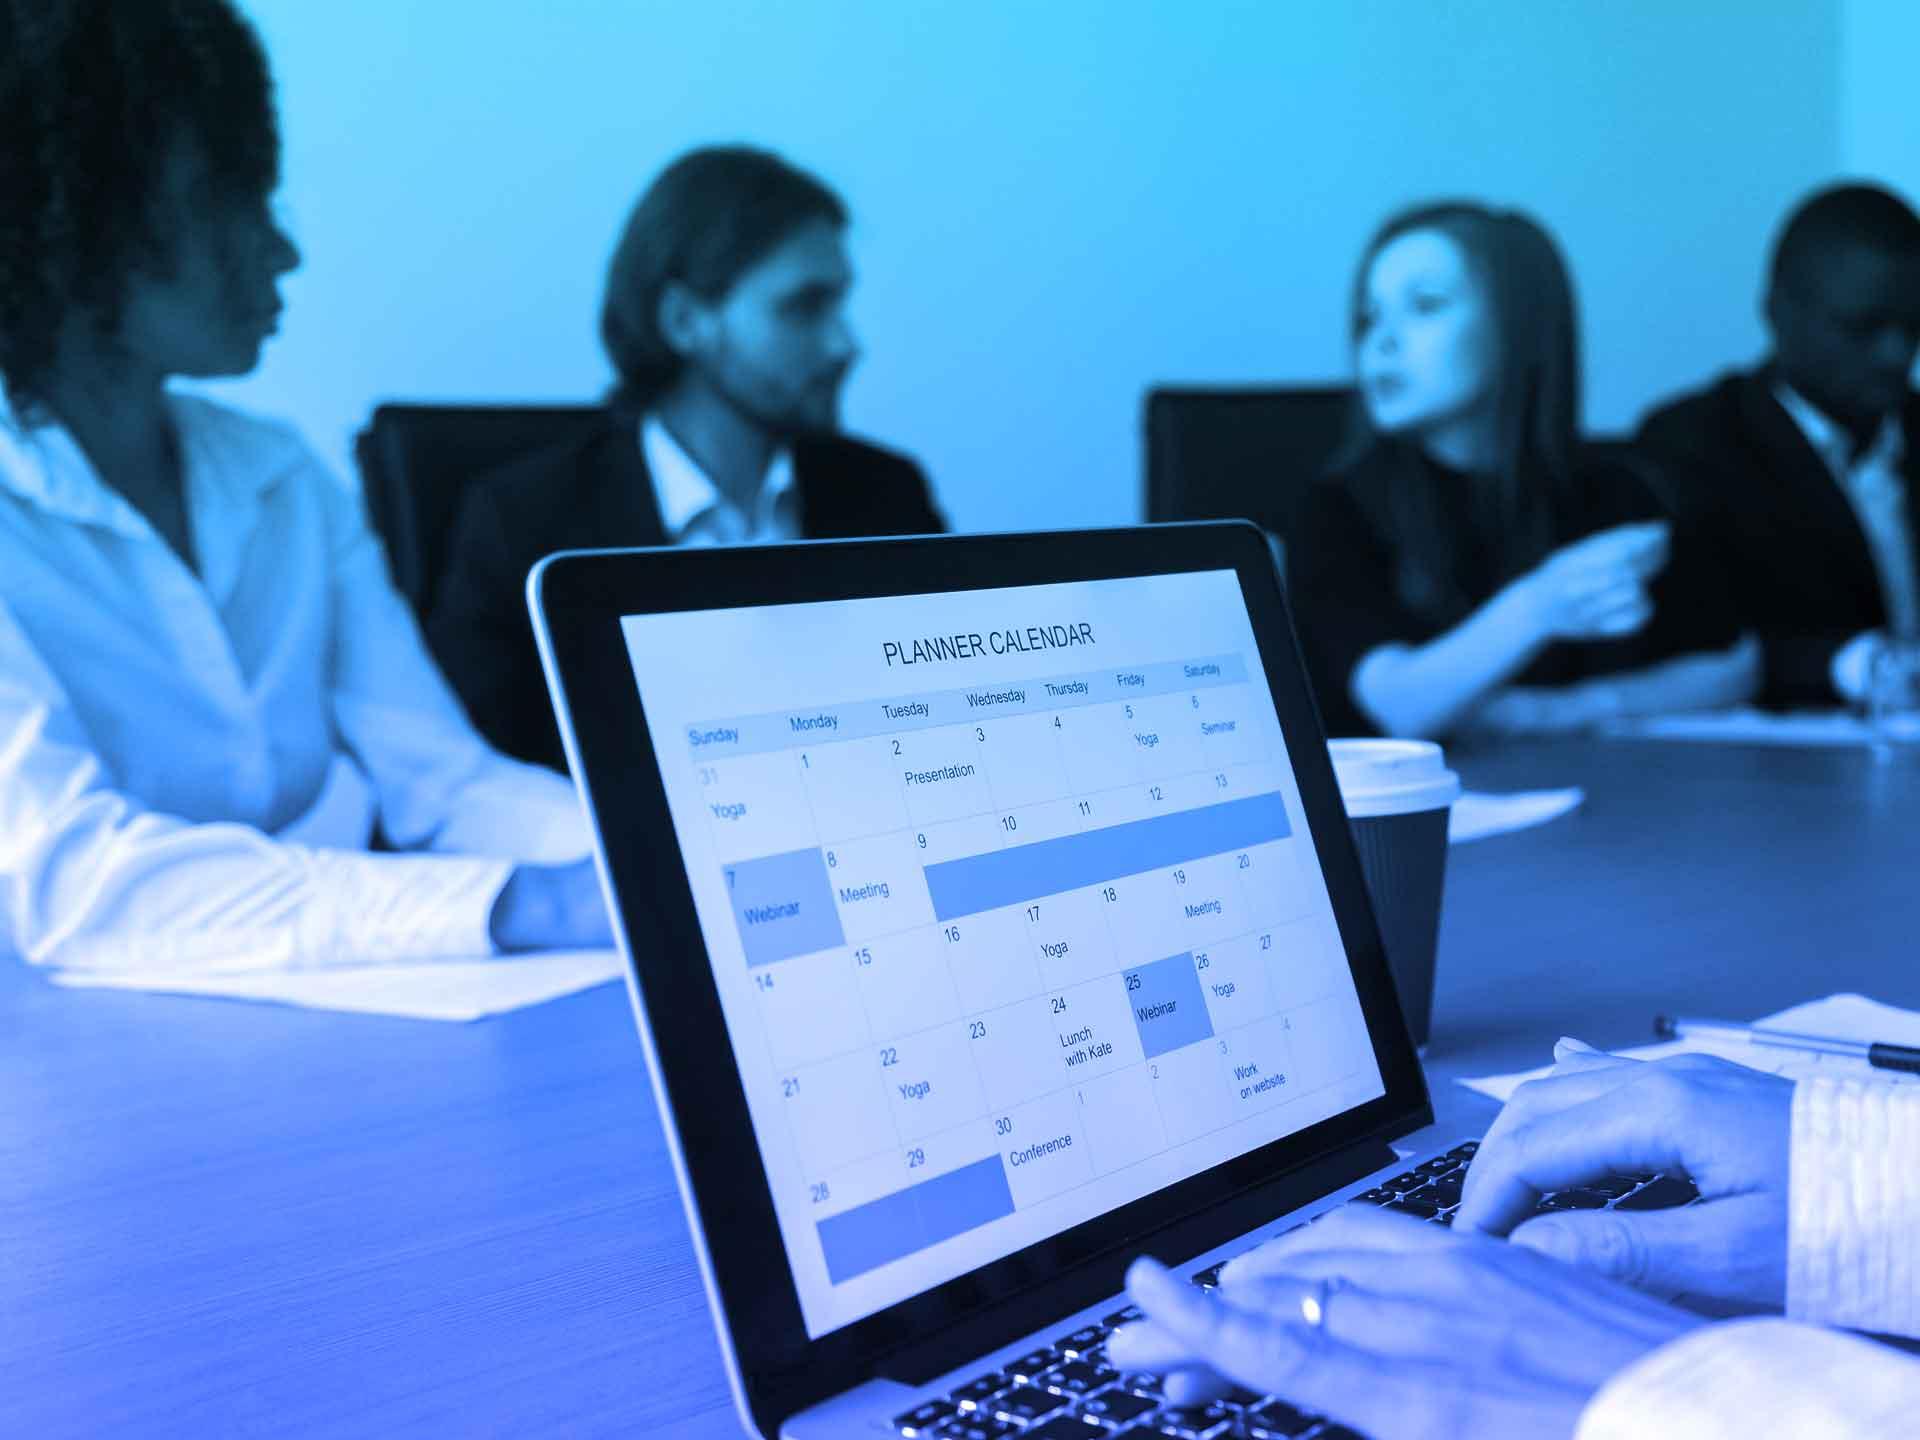 Regel jouw meetings vanuit Microsoft Outlook